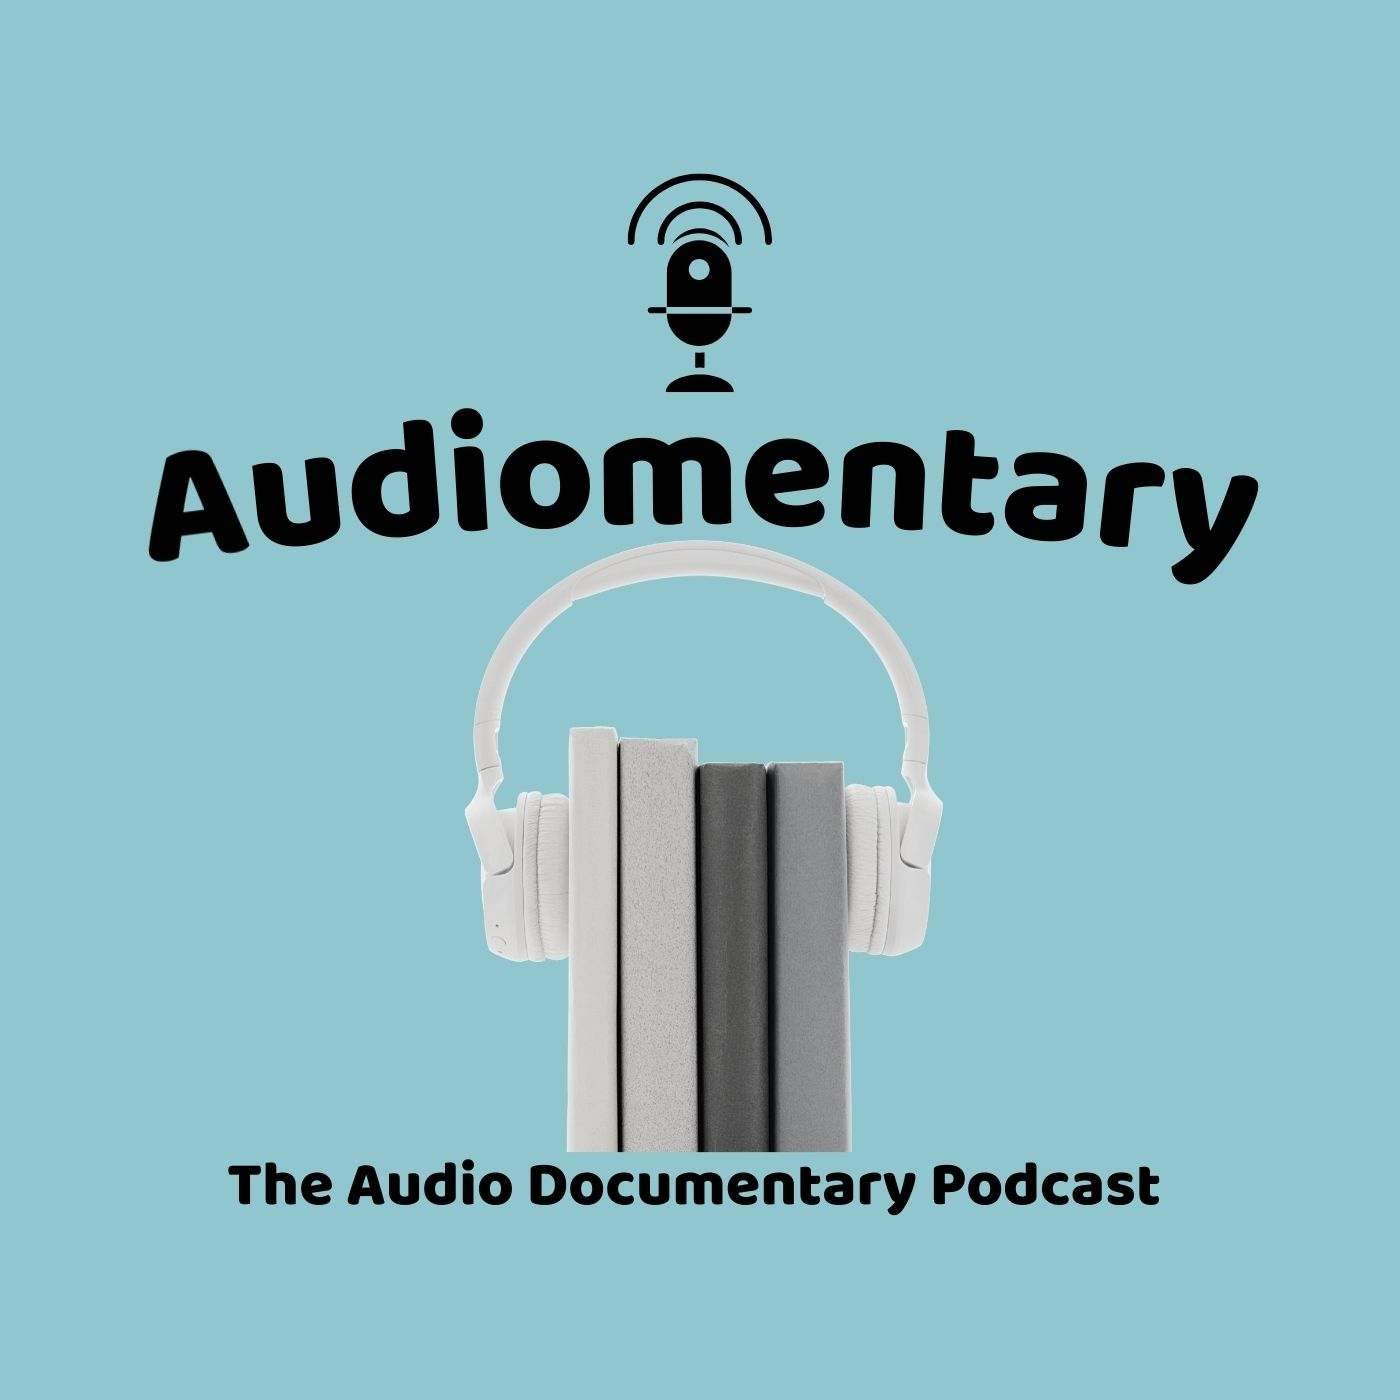 Audiomentary